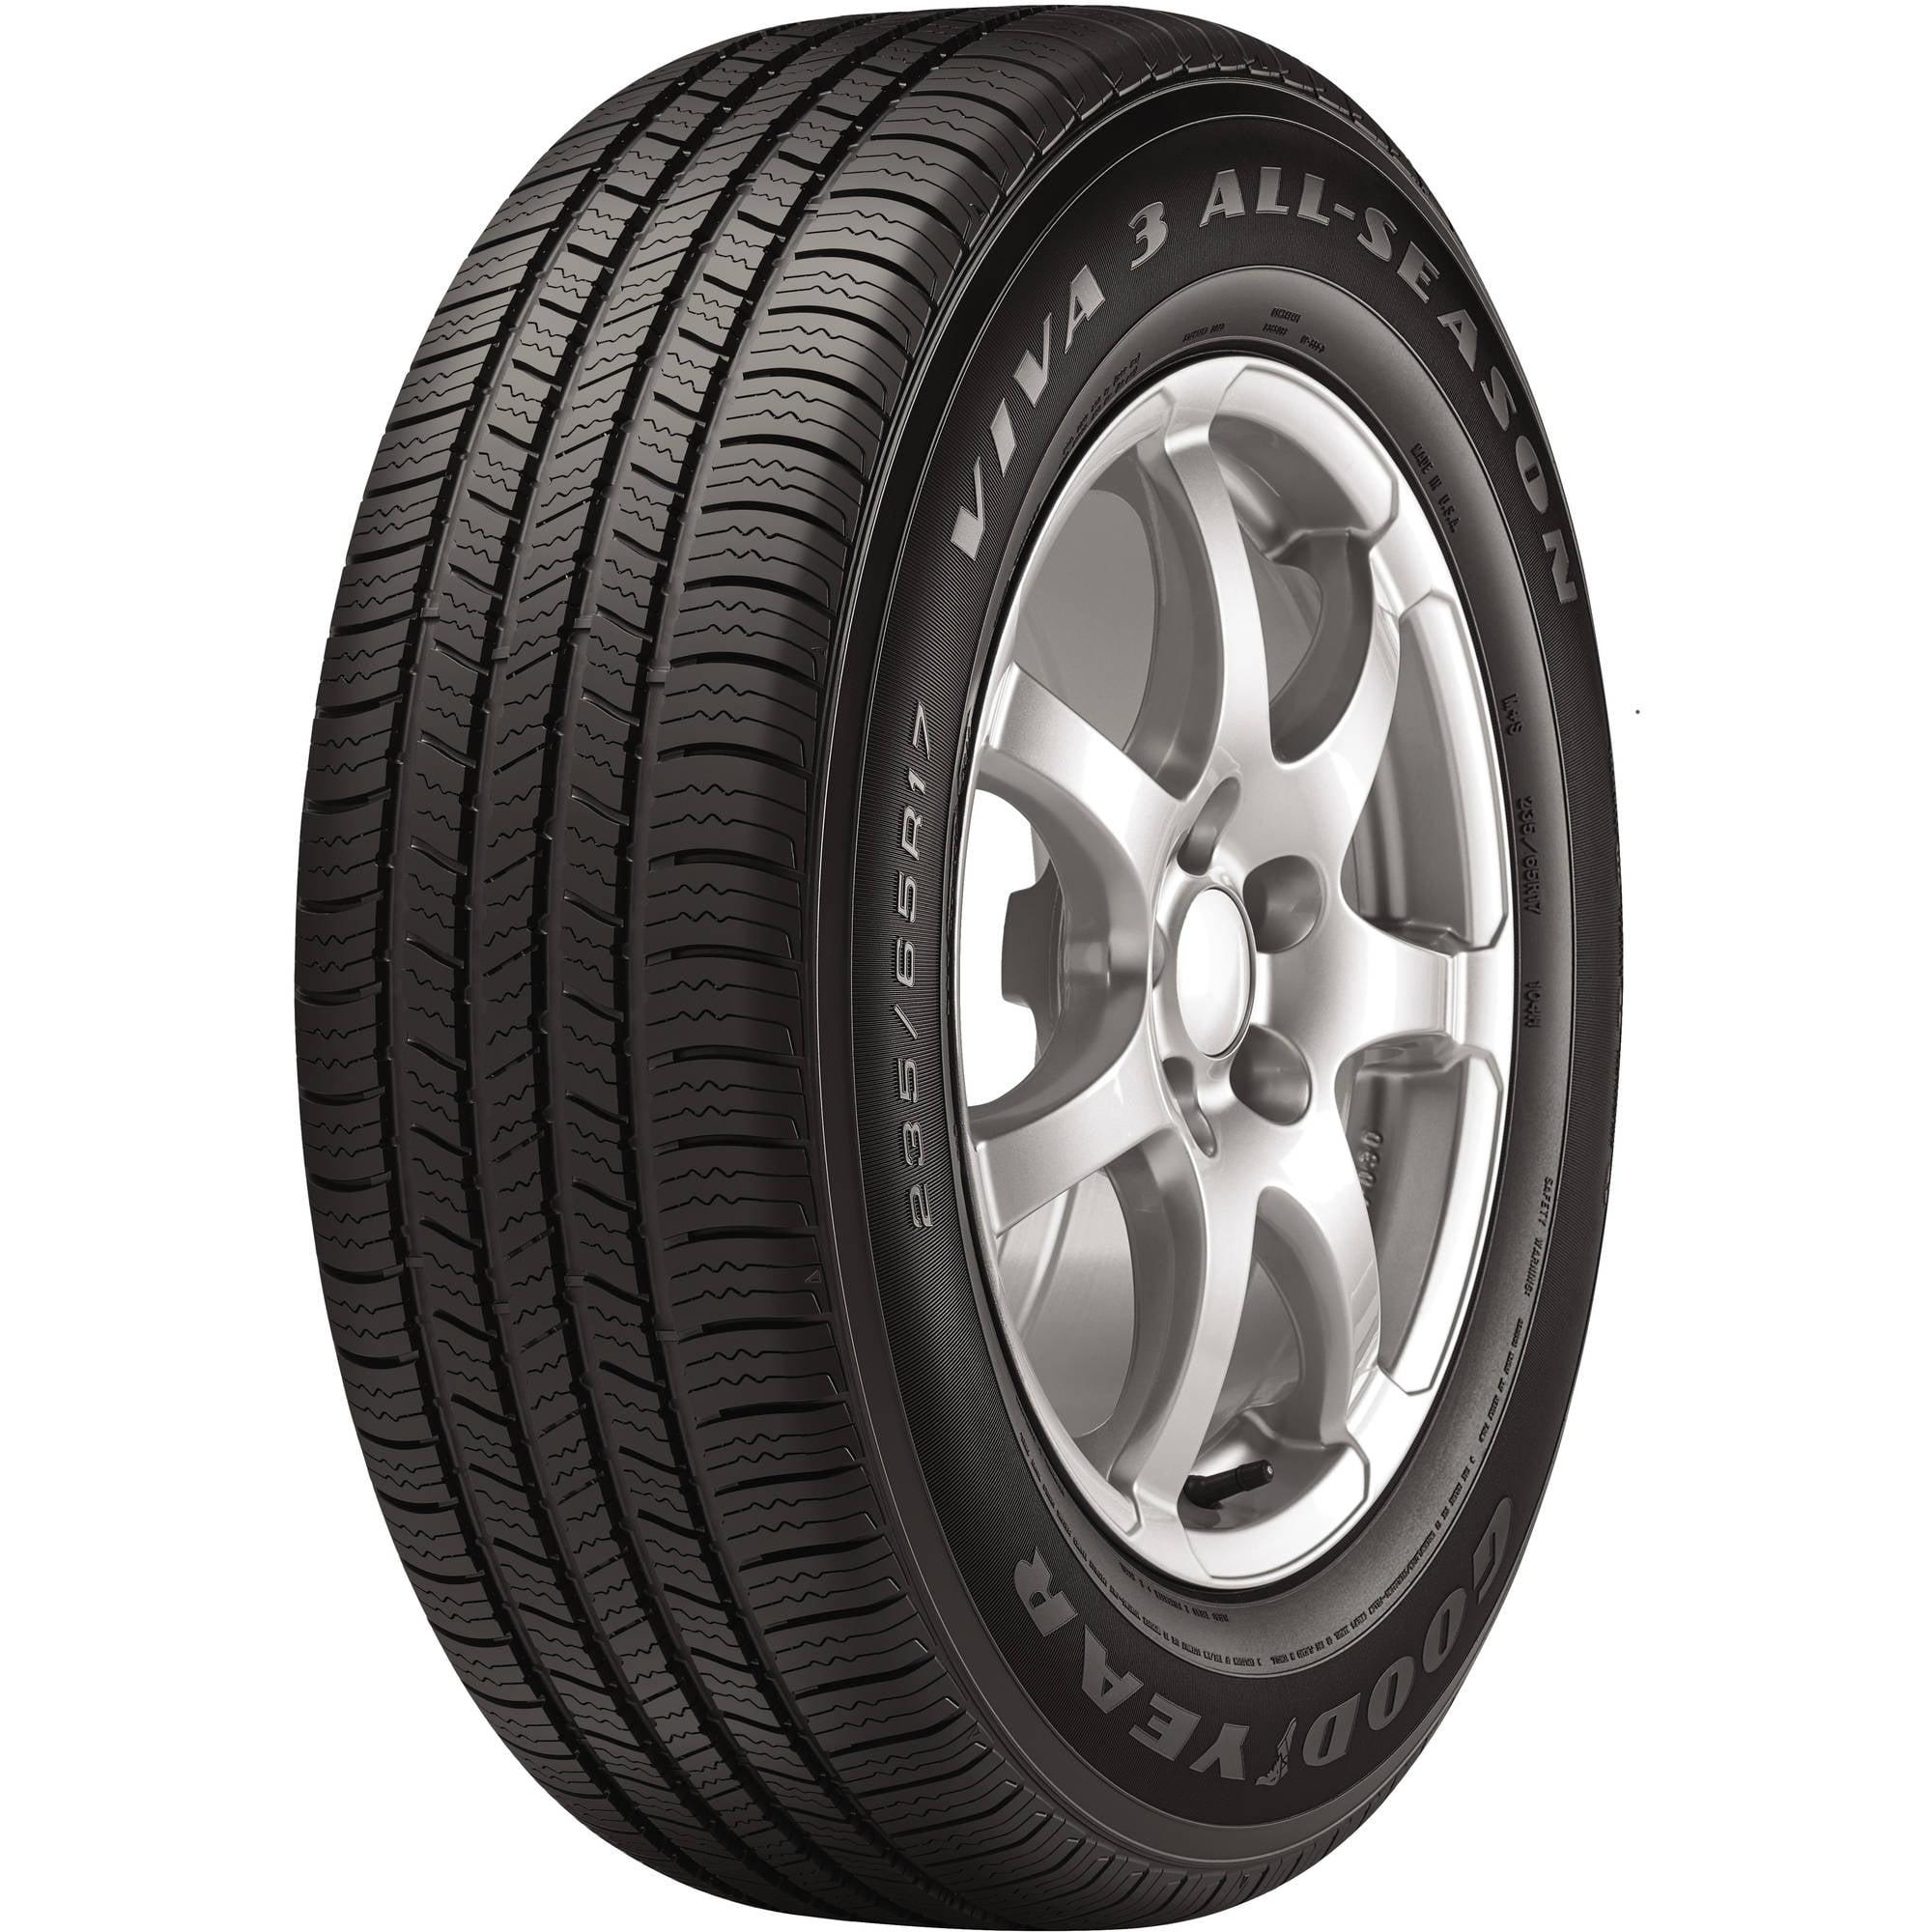 Goodyear Viva 3 All-Season Tire 225/60R16 98T